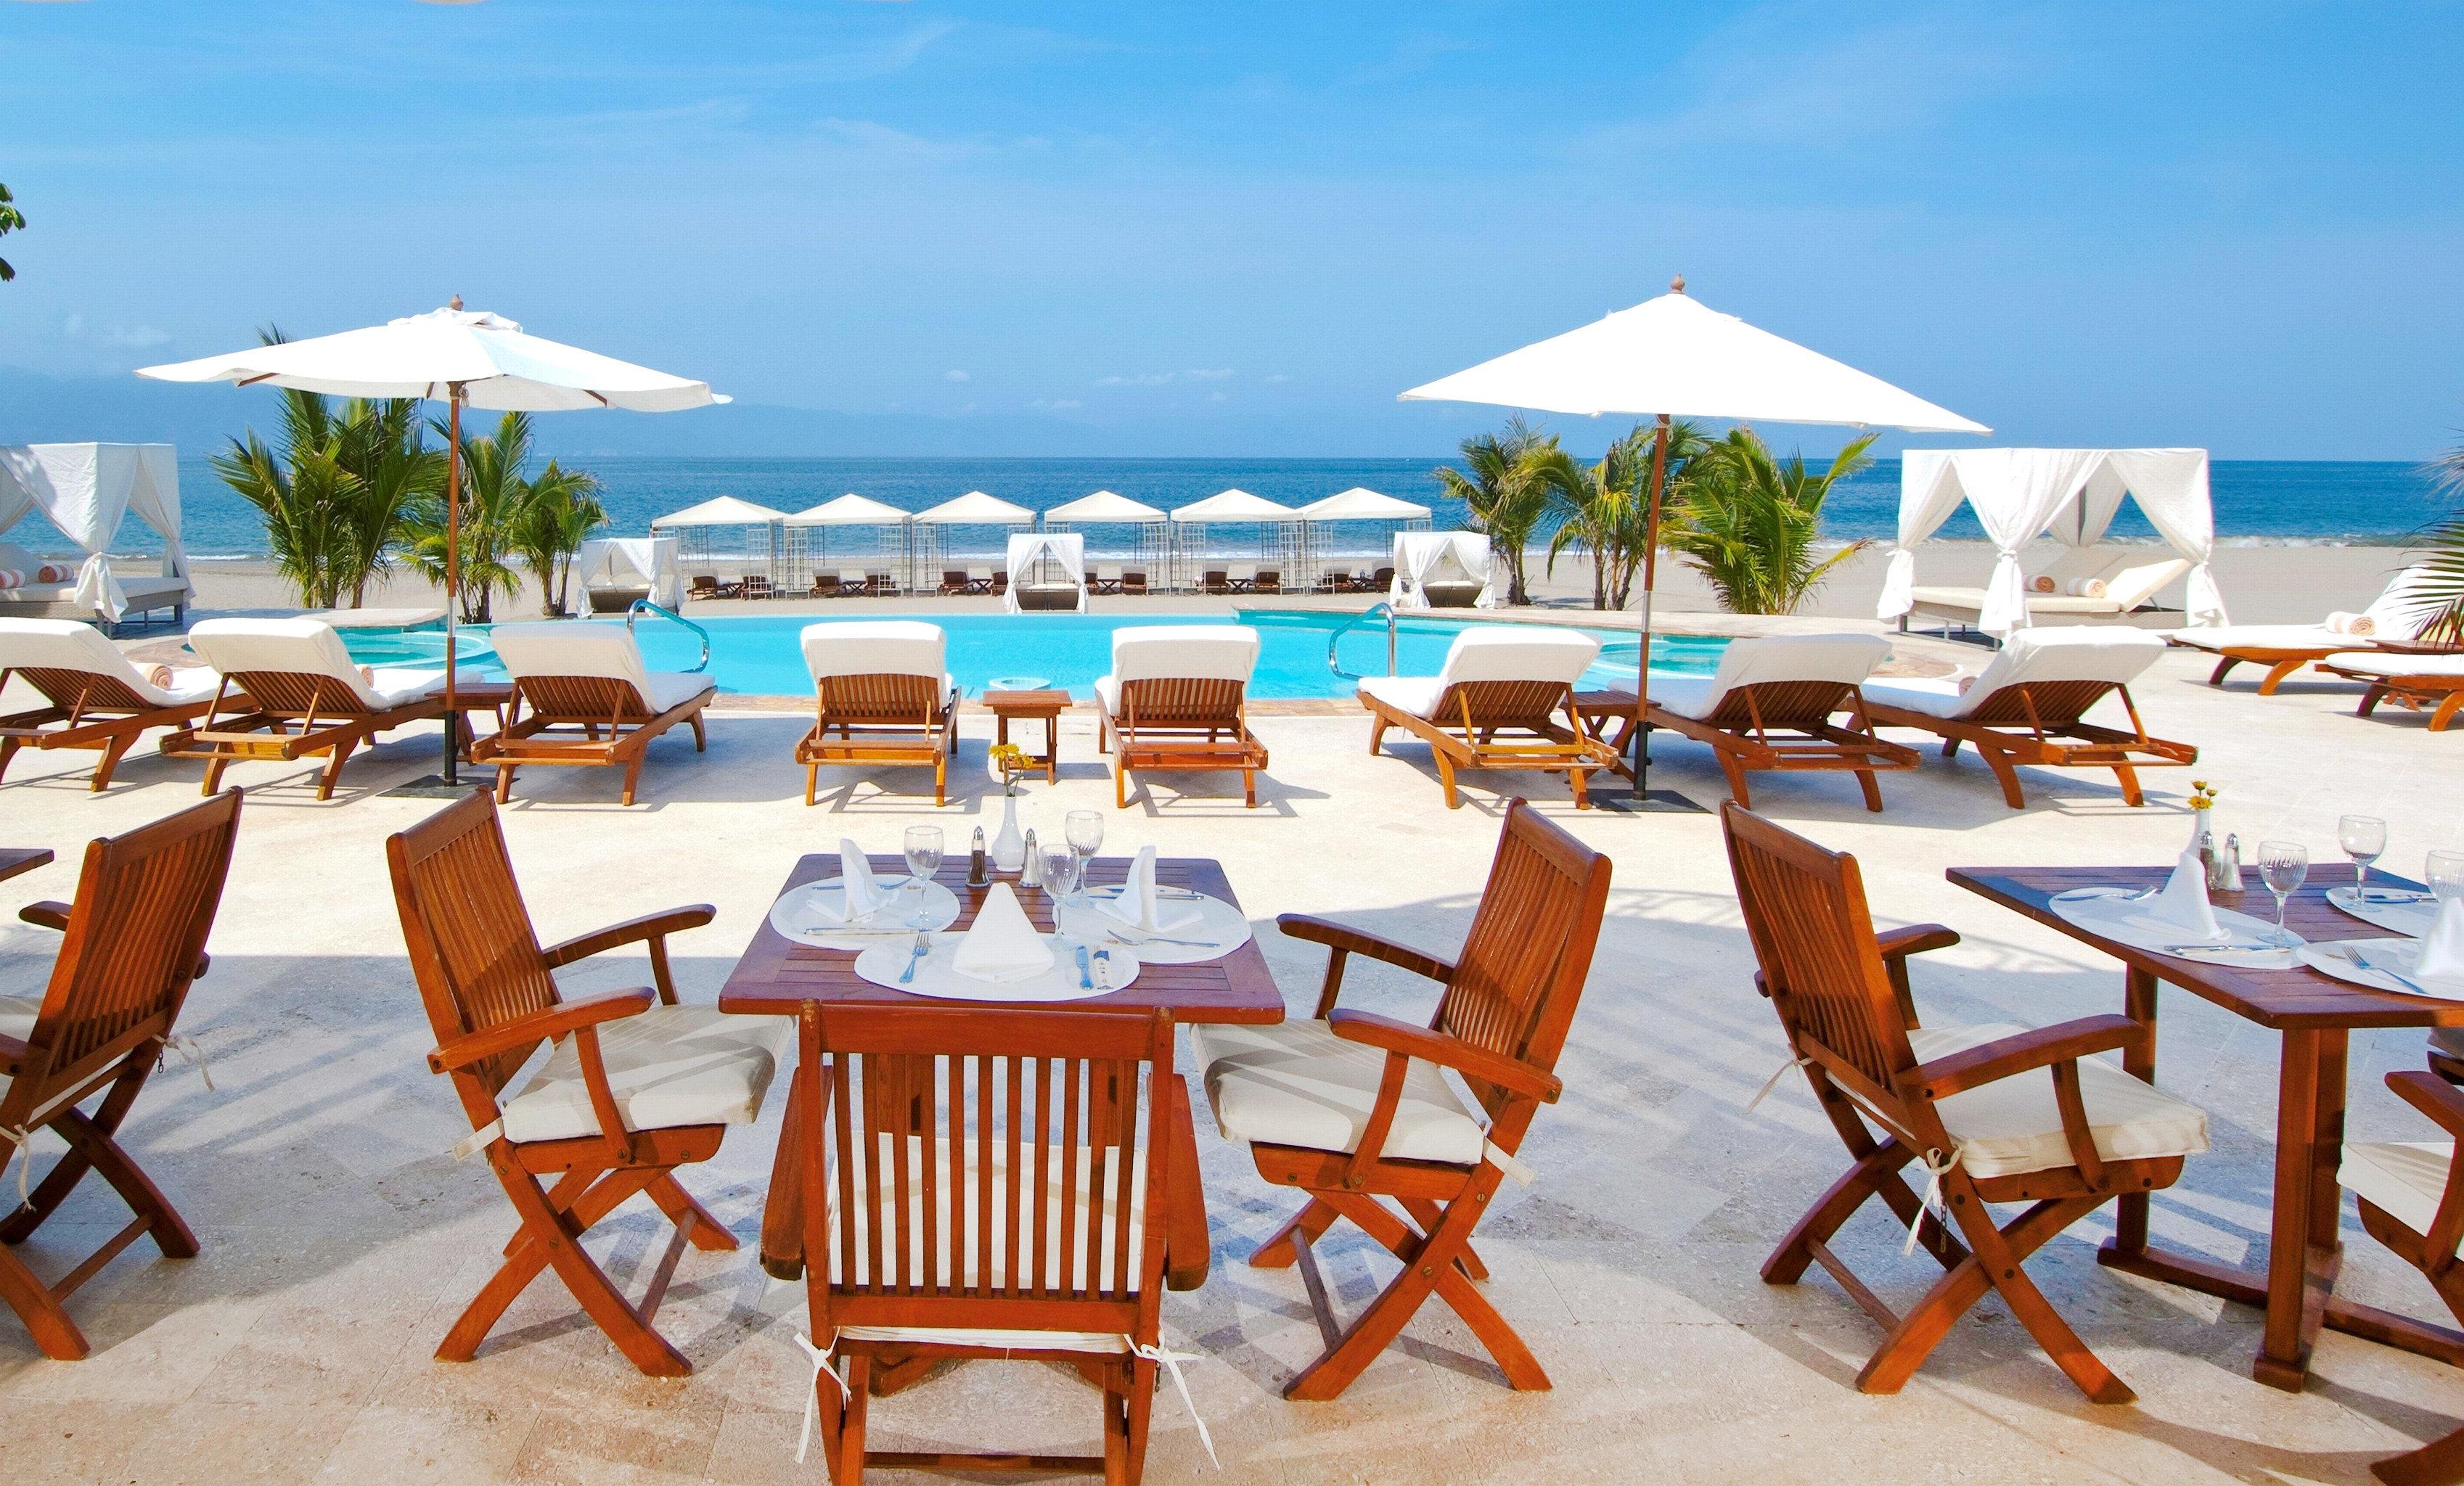 Elegant Lounge Luxury Modern Pool chair umbrella sky leisure Resort lawn caribbean restaurant Villa Dining set lined day